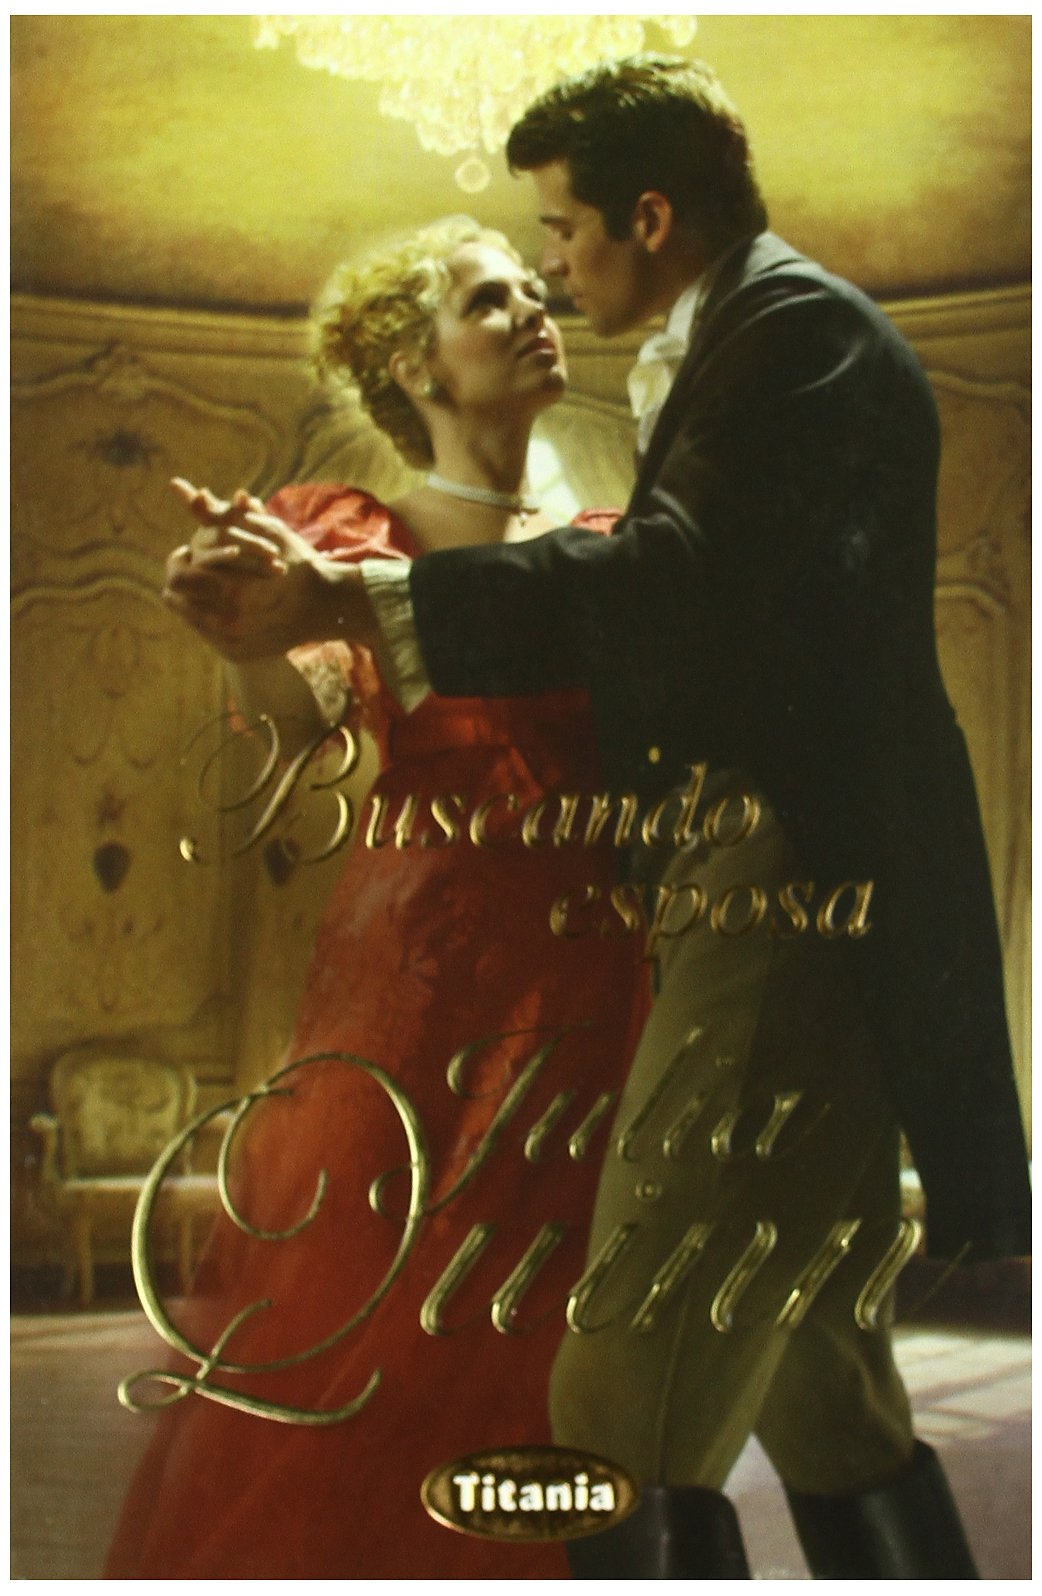 Portadas de Novelas Romanticas - Página 22 71SRriCszzL